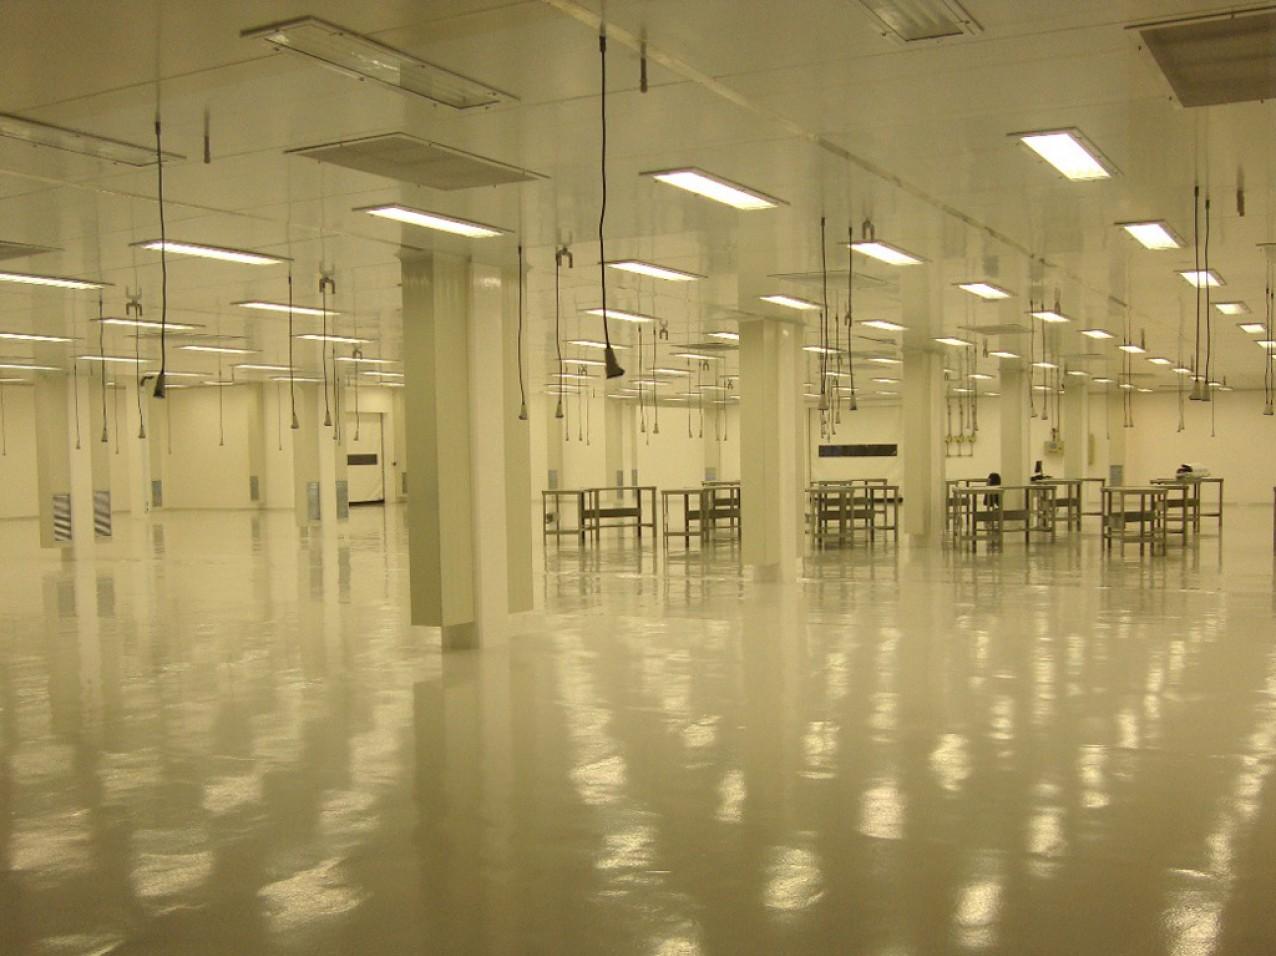 Obra industrial Alestis Aerospace - Fabrica de materiais compostos